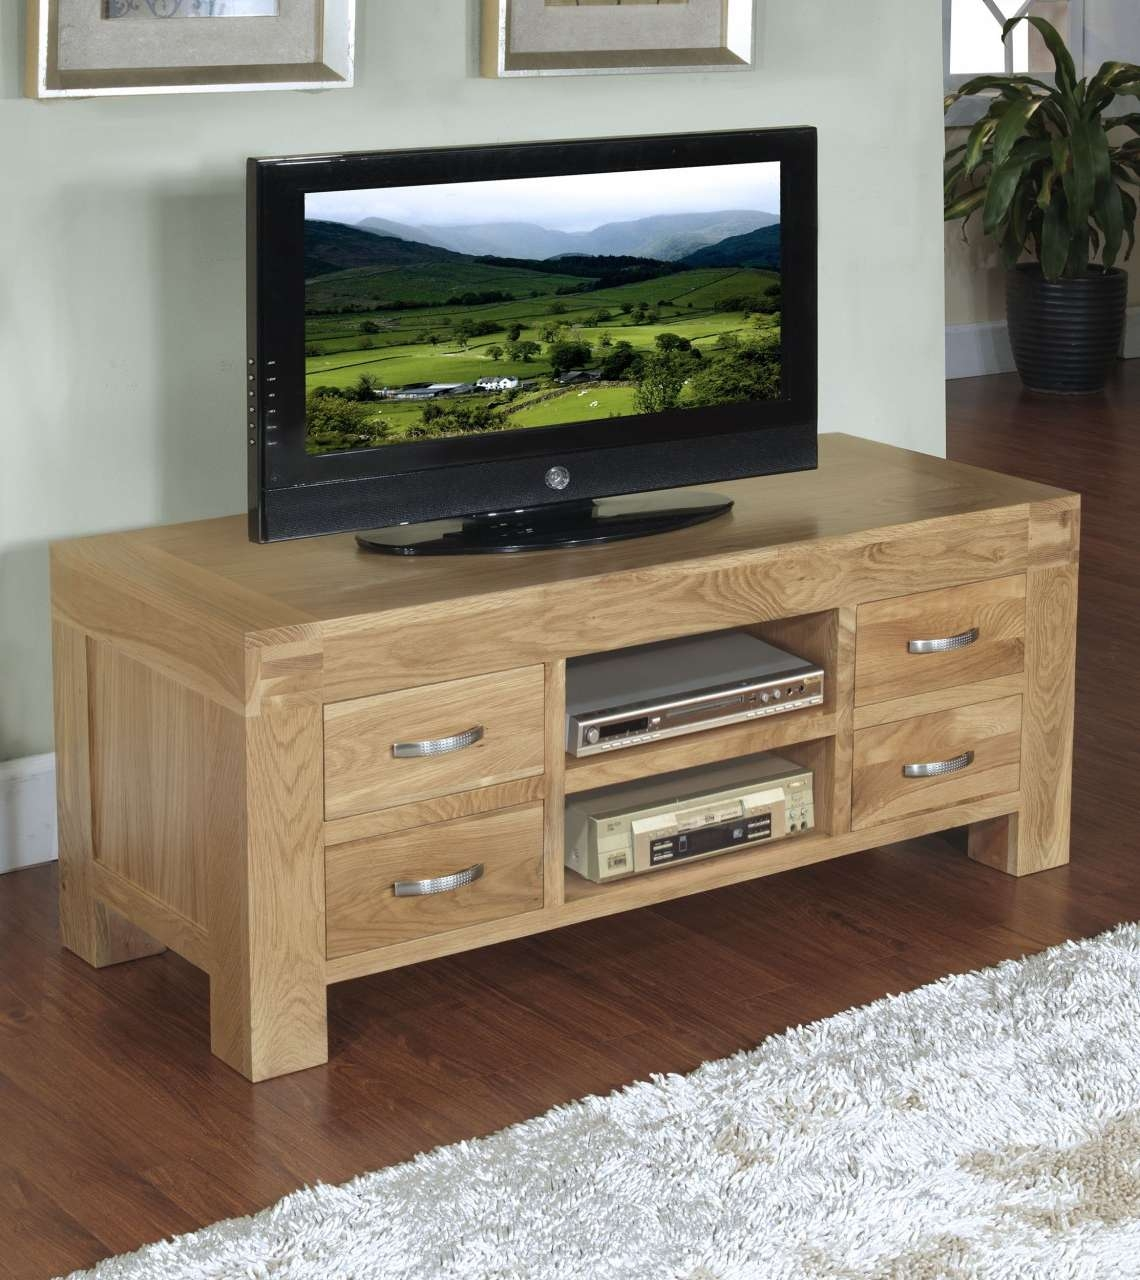 Living Room : White Wooden Corner Furniture Living Room Oak Tv Intended For Oak Tv Cabinets (View 3 of 20)